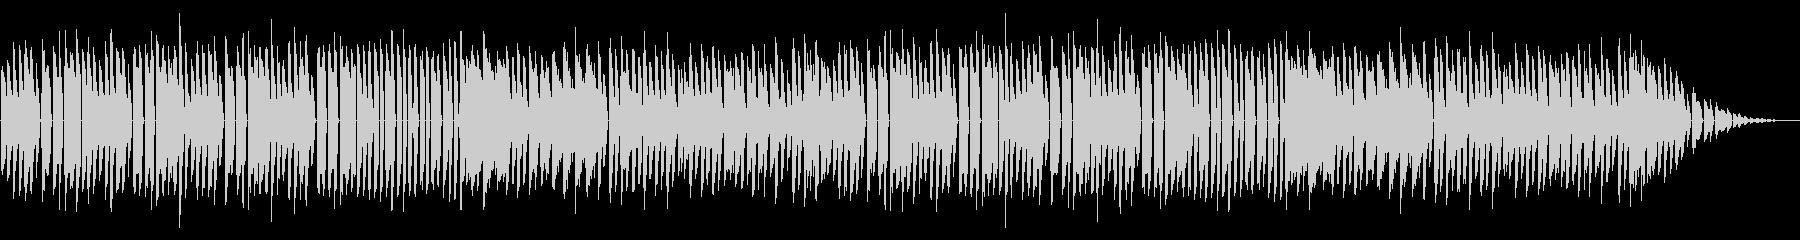 NES アクションD05-1(ステージ4の未再生の波形